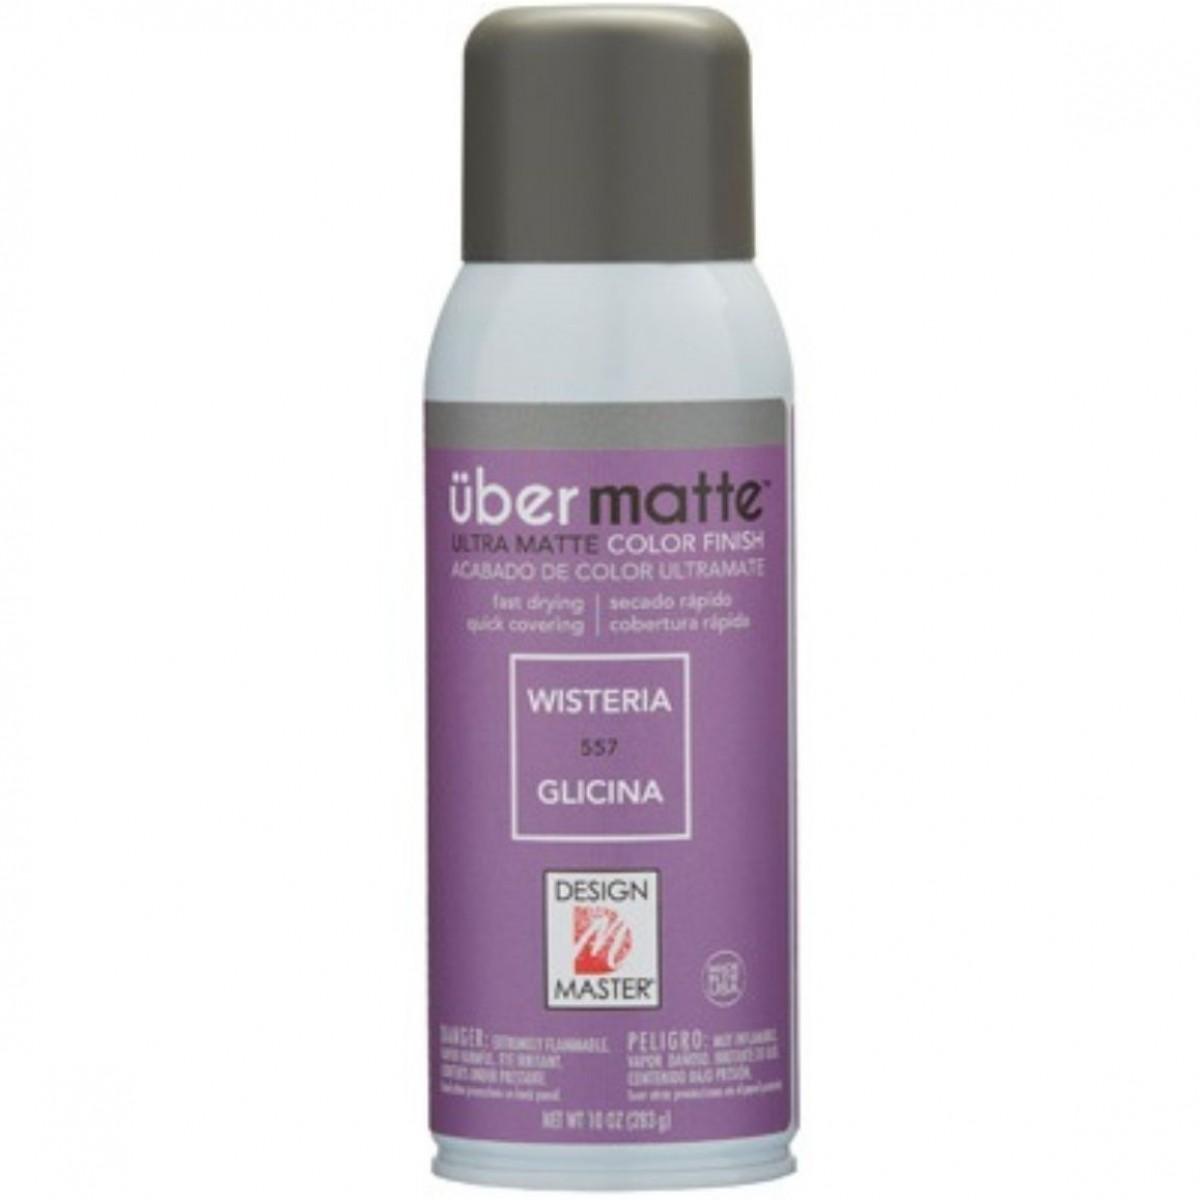 557 Wisteria DM Ubermatt Colour Spray Paint - 1 No